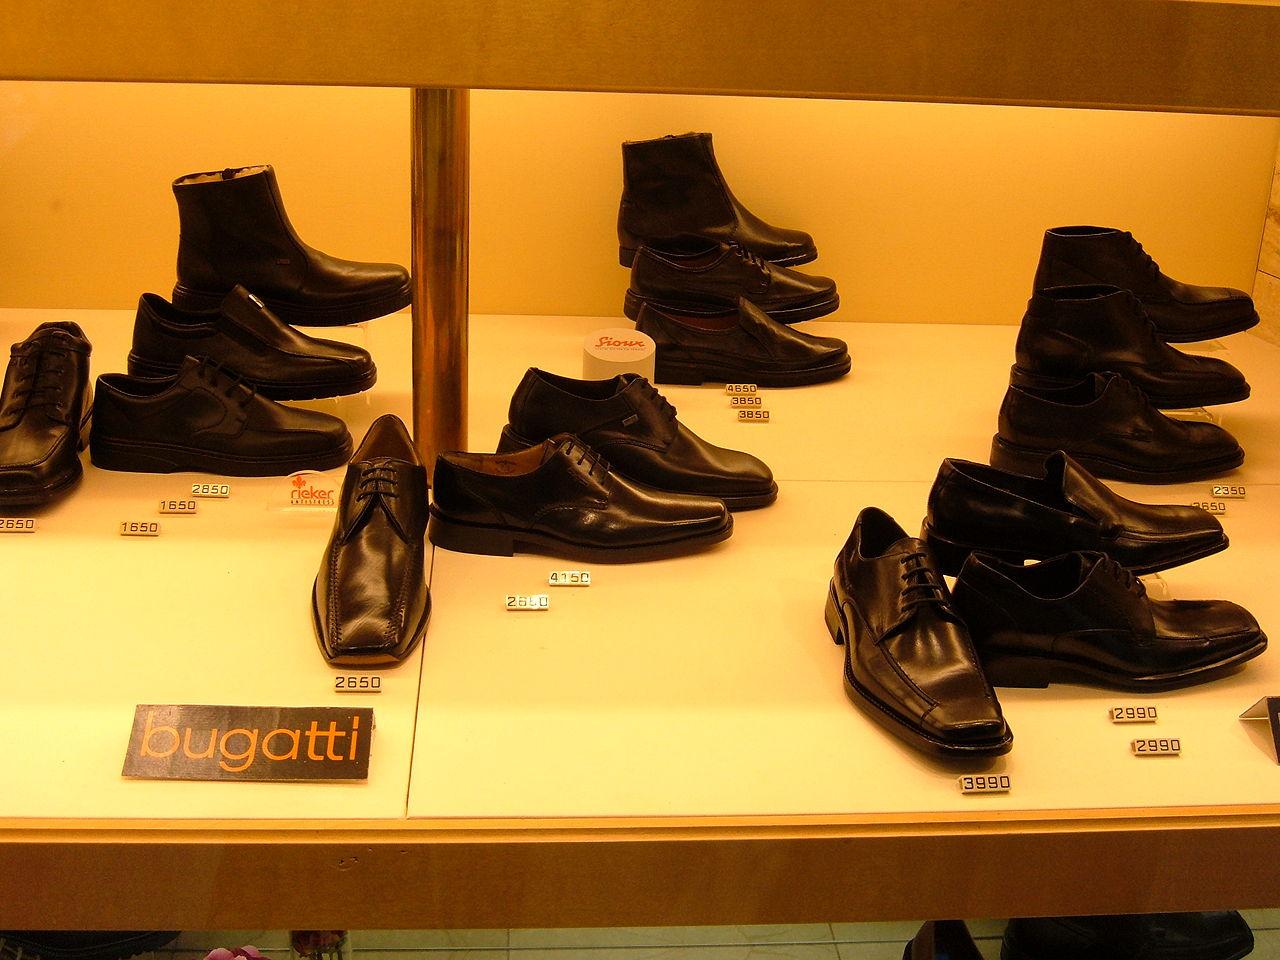 File Bugatti Shoes On Display Prague Jpg Wikimedia Commons